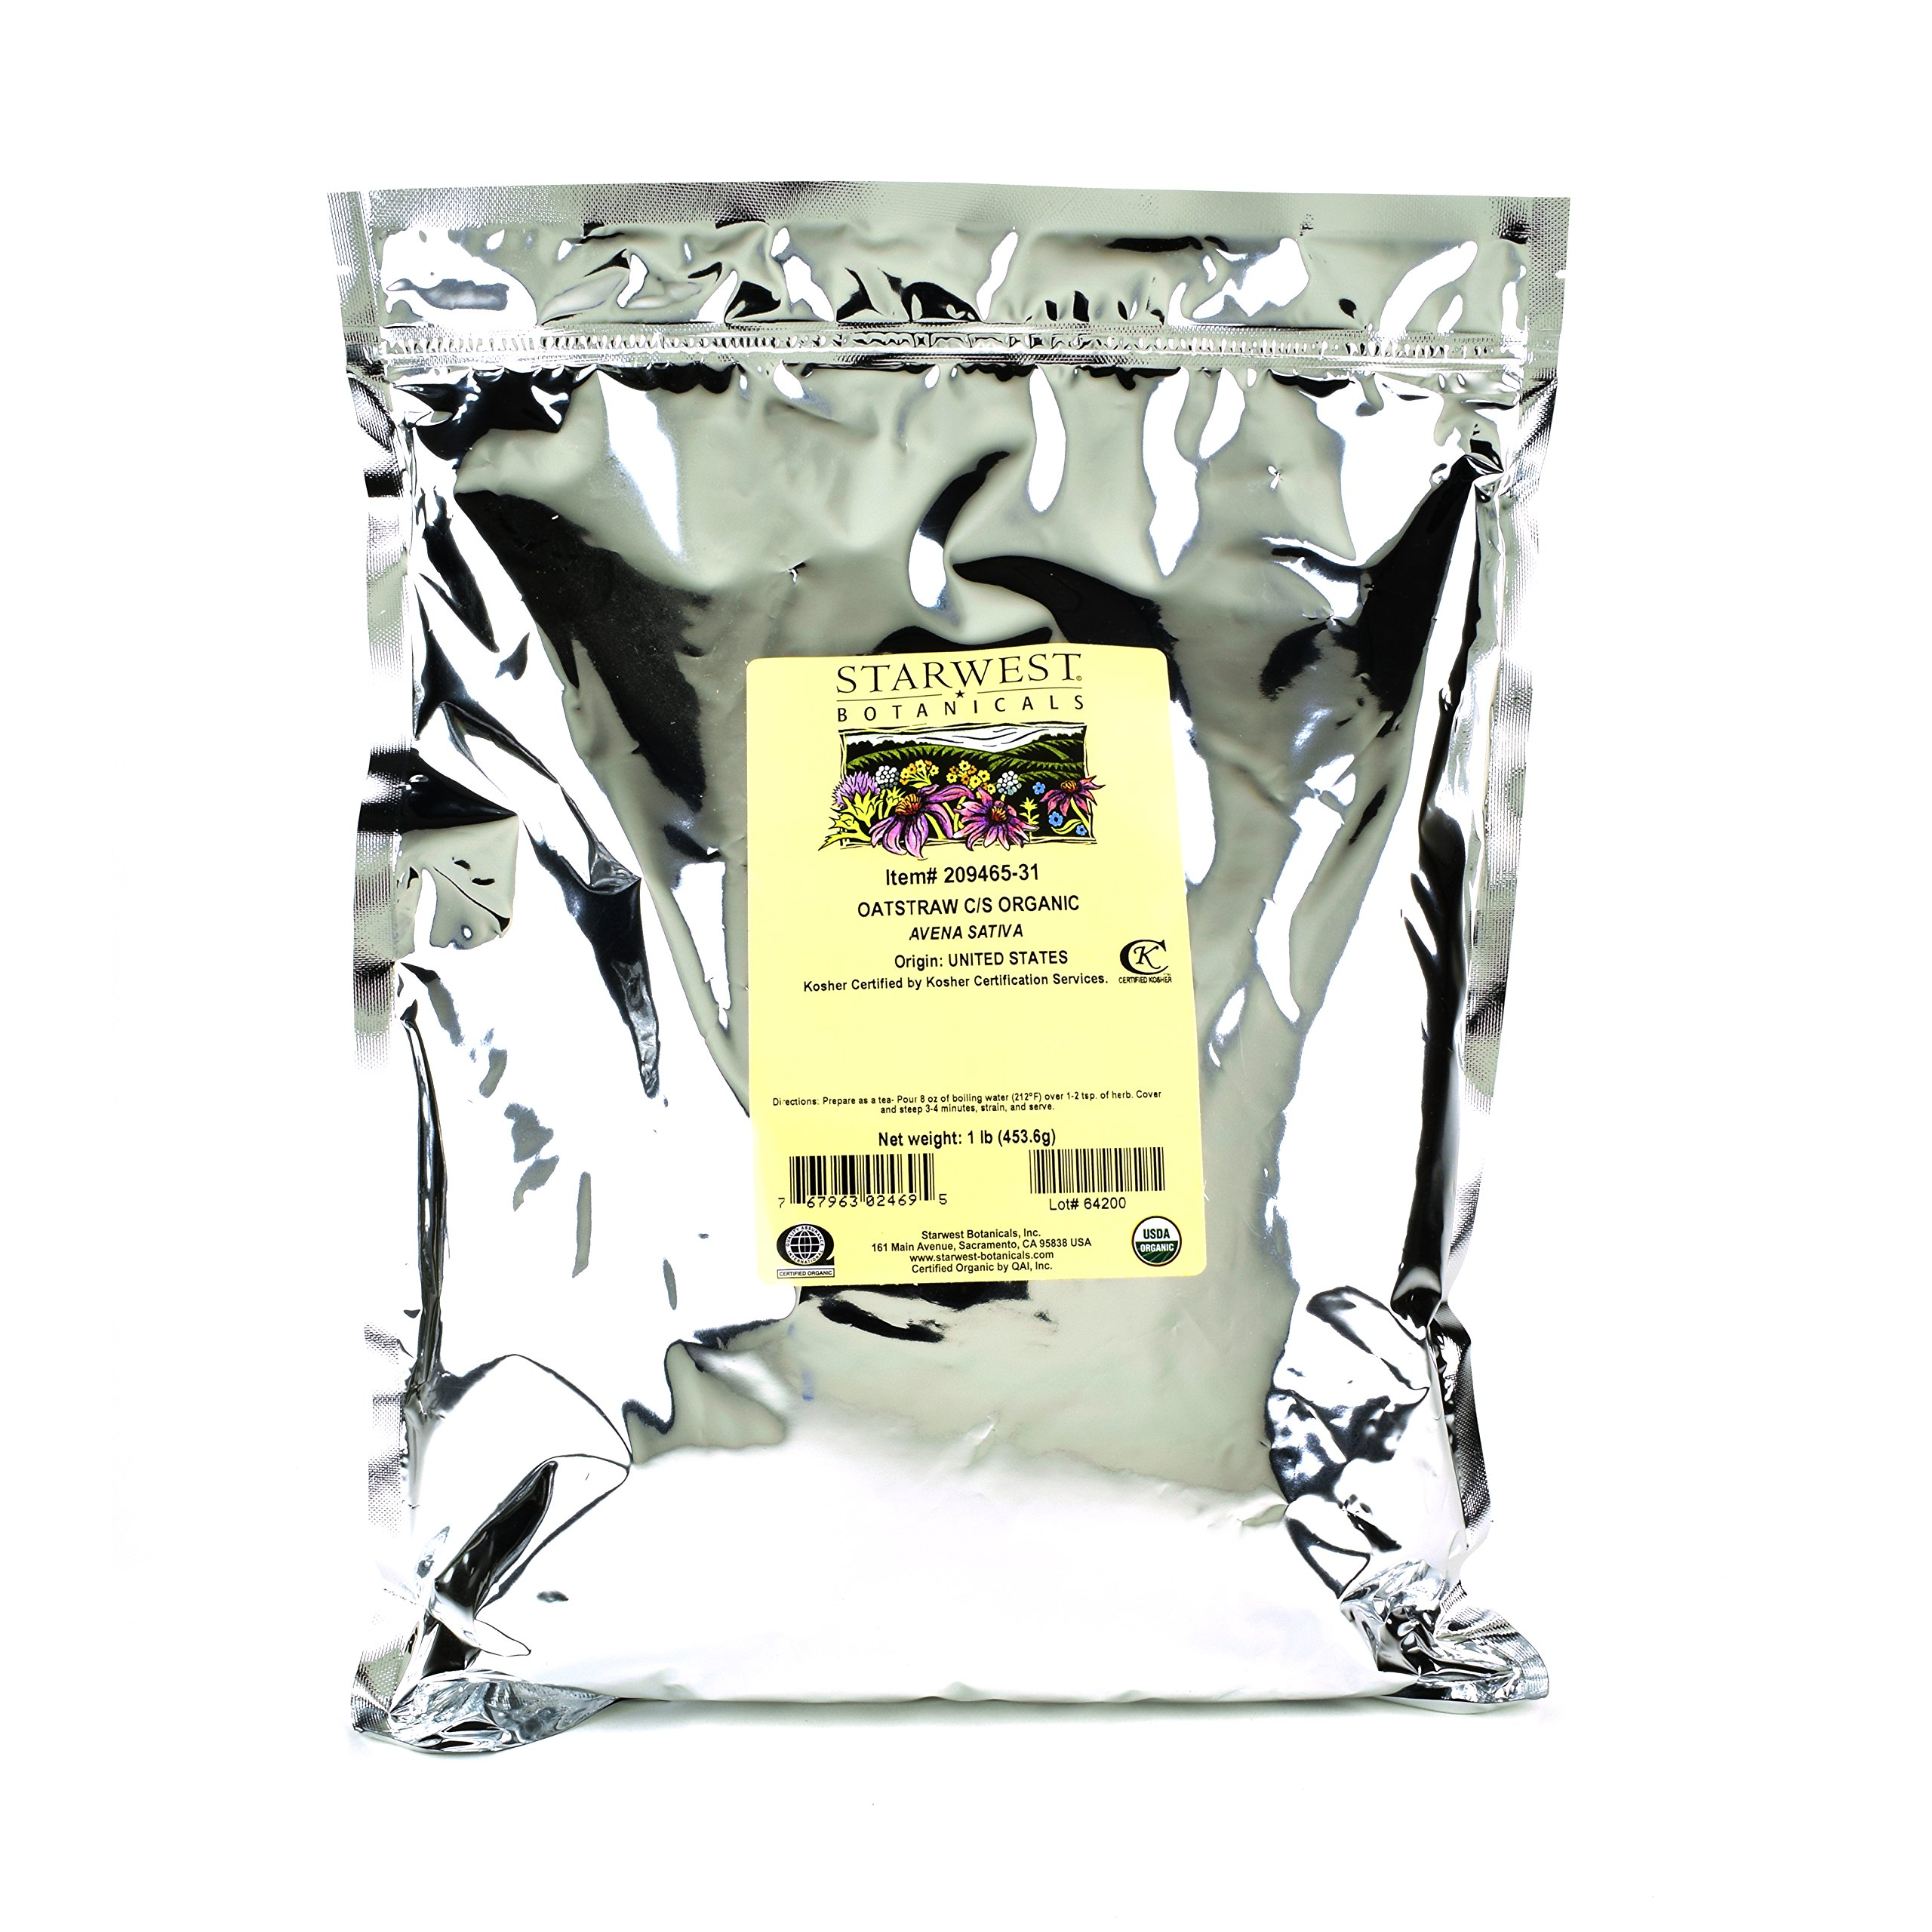 Starwest Botanicals Organic American Oatstraw Herb Loose Tea Cut and Sifted, 1 Pound Bulk Bag